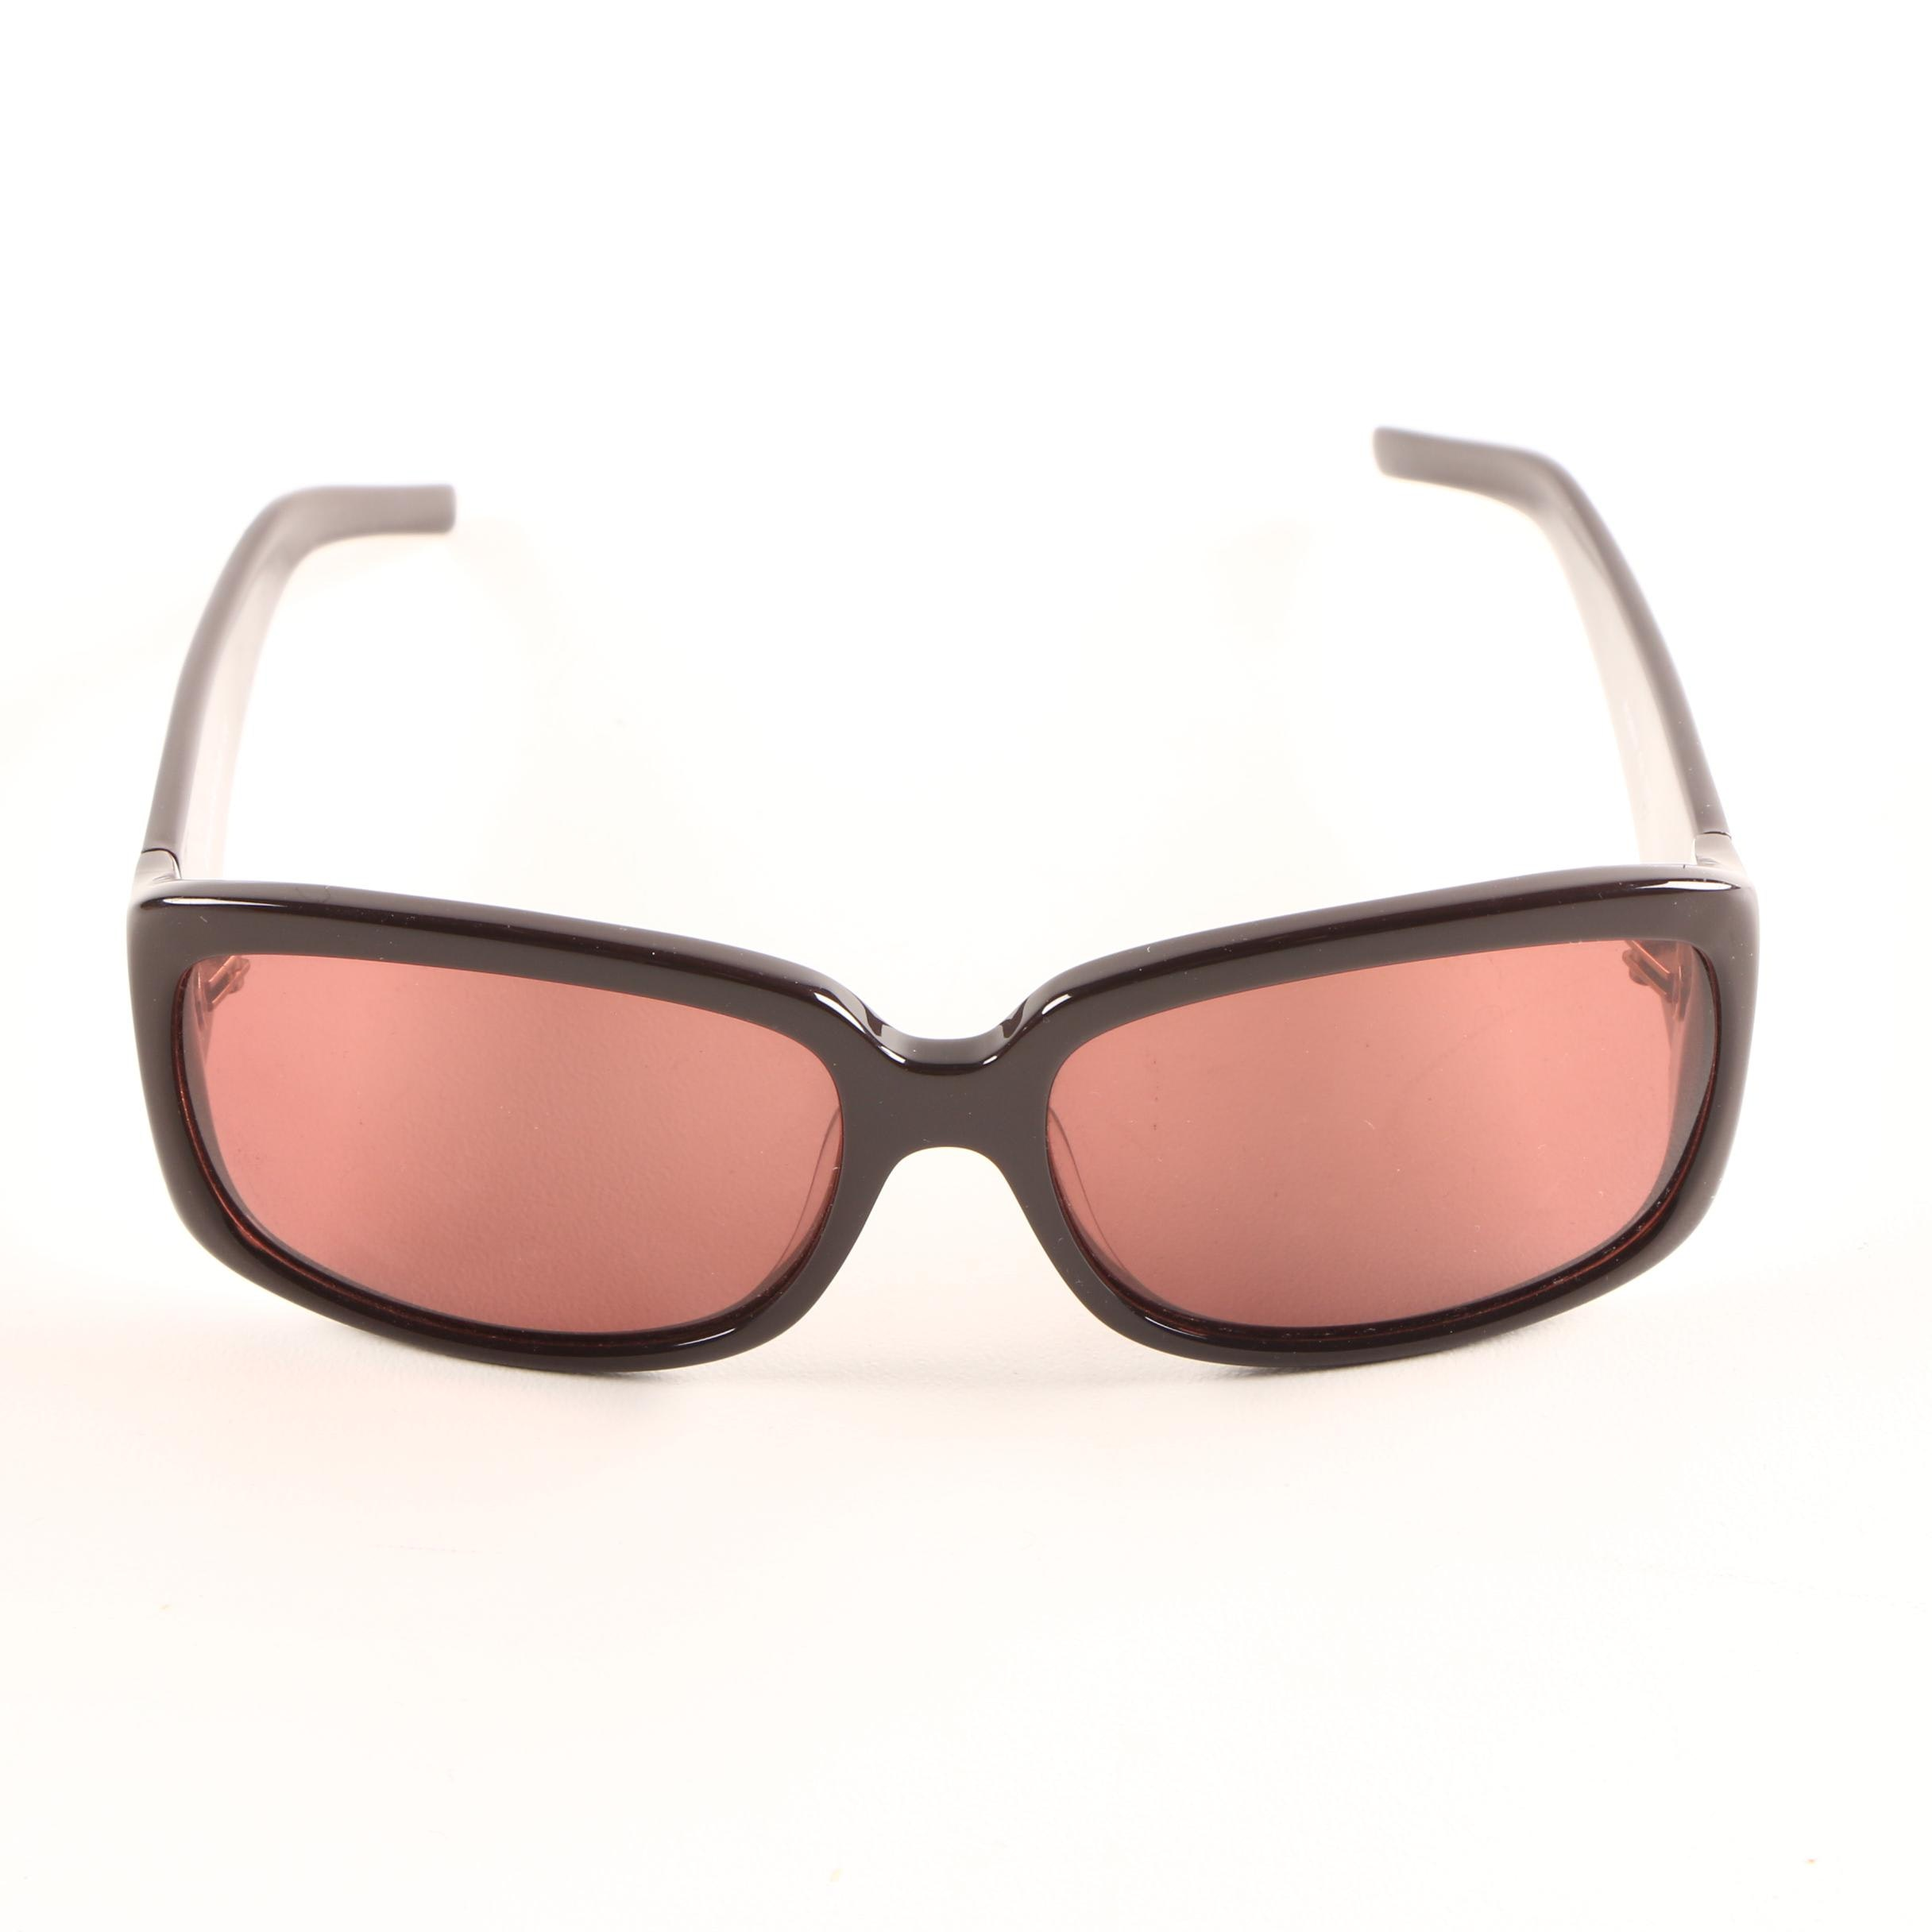 Charriol PC8074 Sunglasses